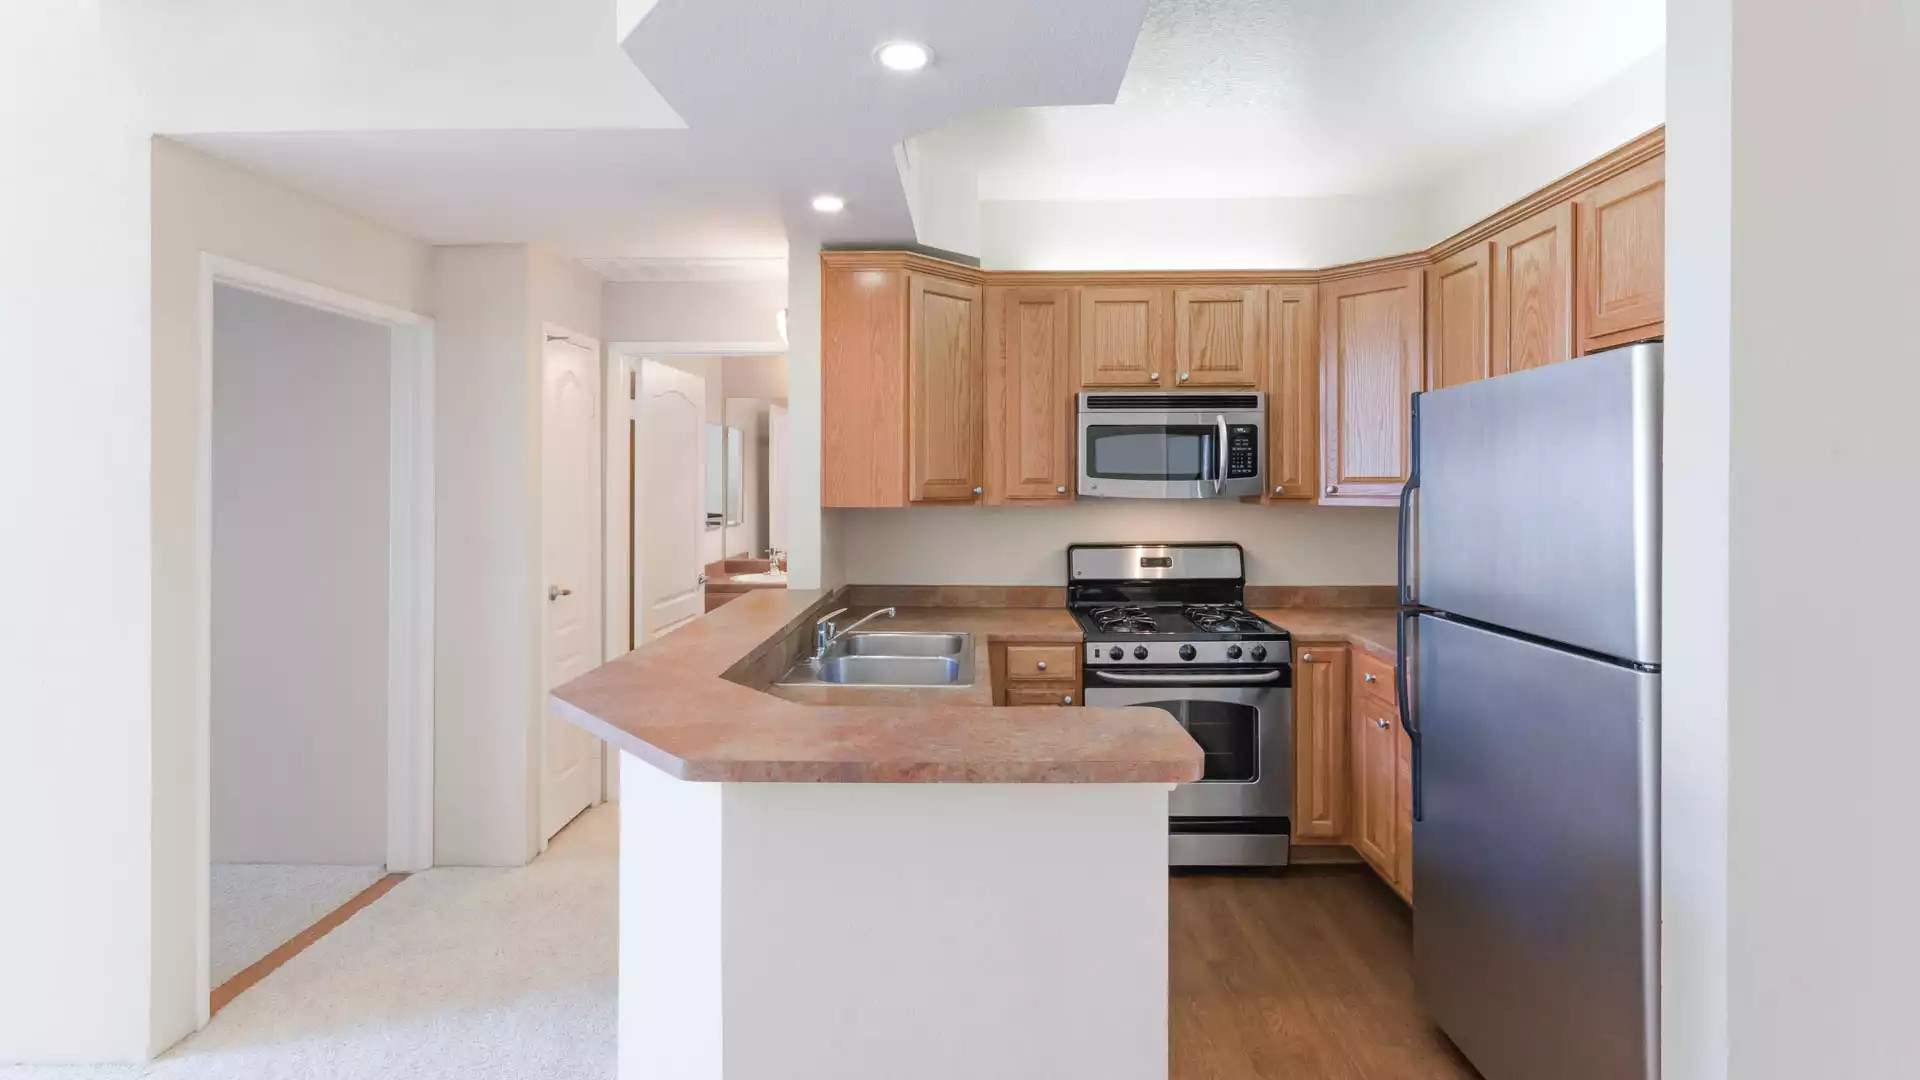 Academy Village Apartments - North Hollywood, CA